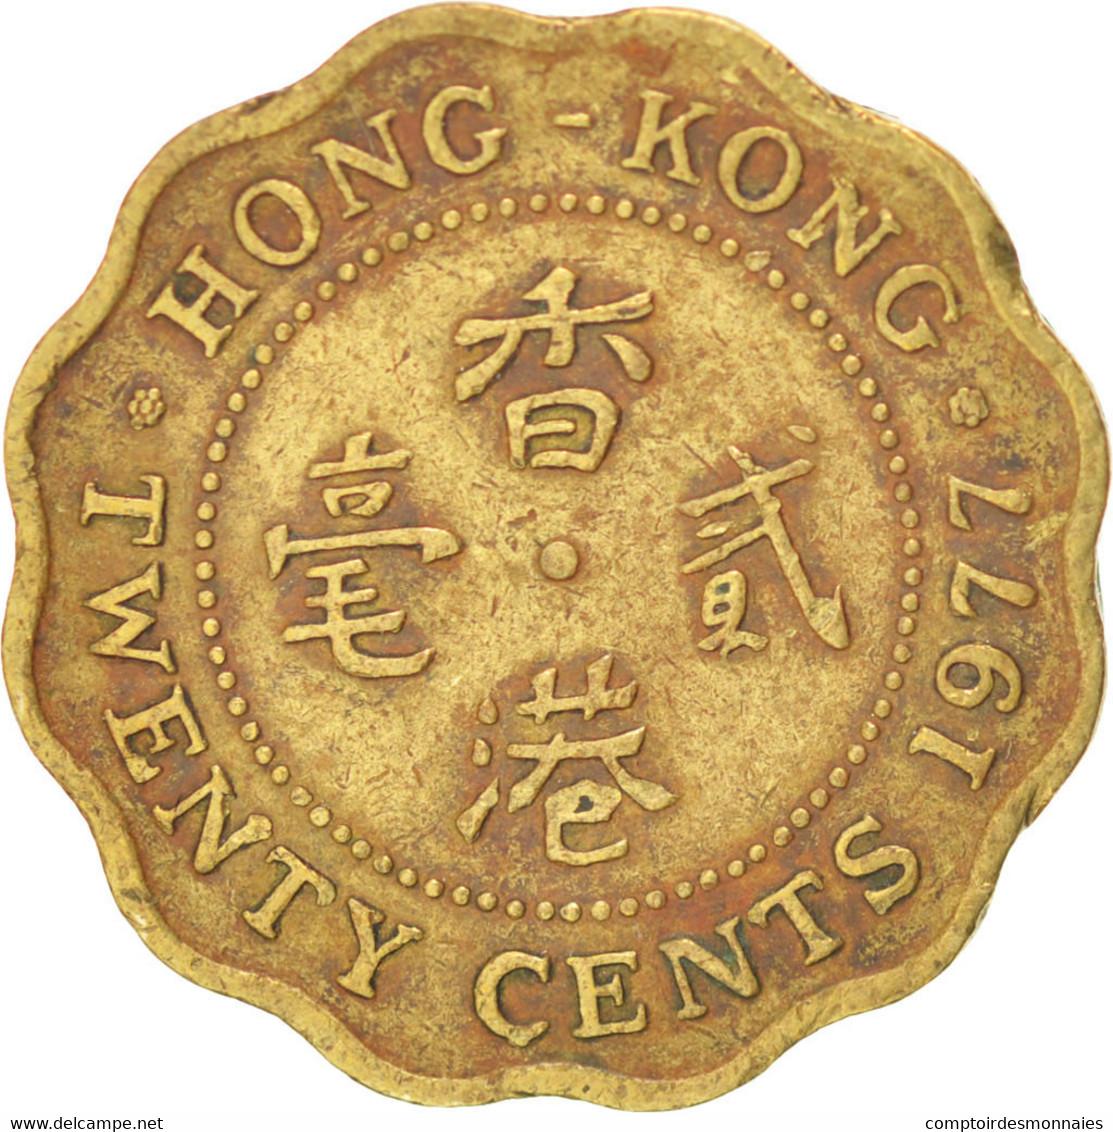 [#38278] Hong Kong, Elizabeth II, 20 Cents, 1977, KM 36 - Hong Kong